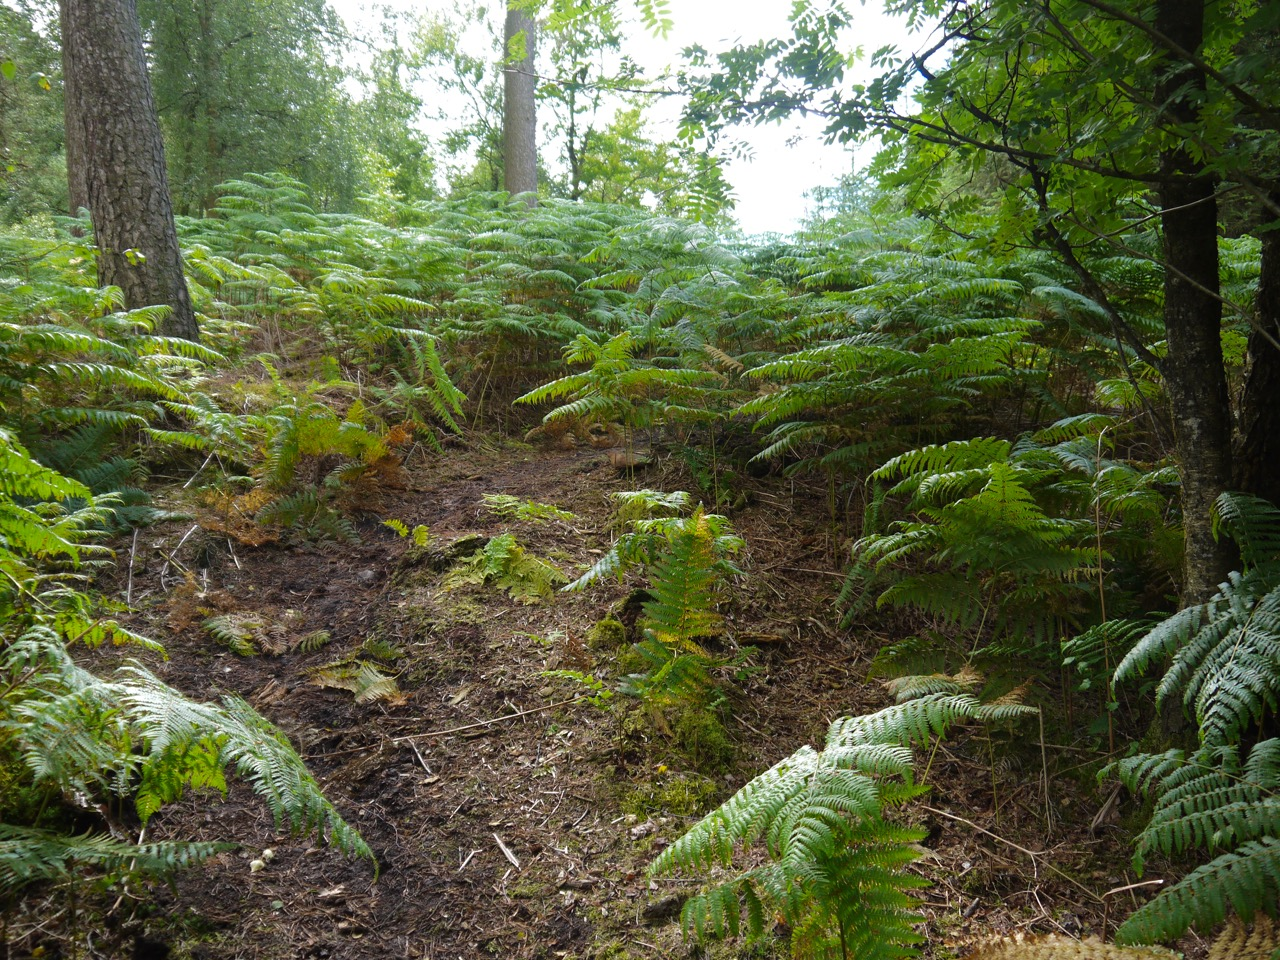 The way into Corncockle Plantation